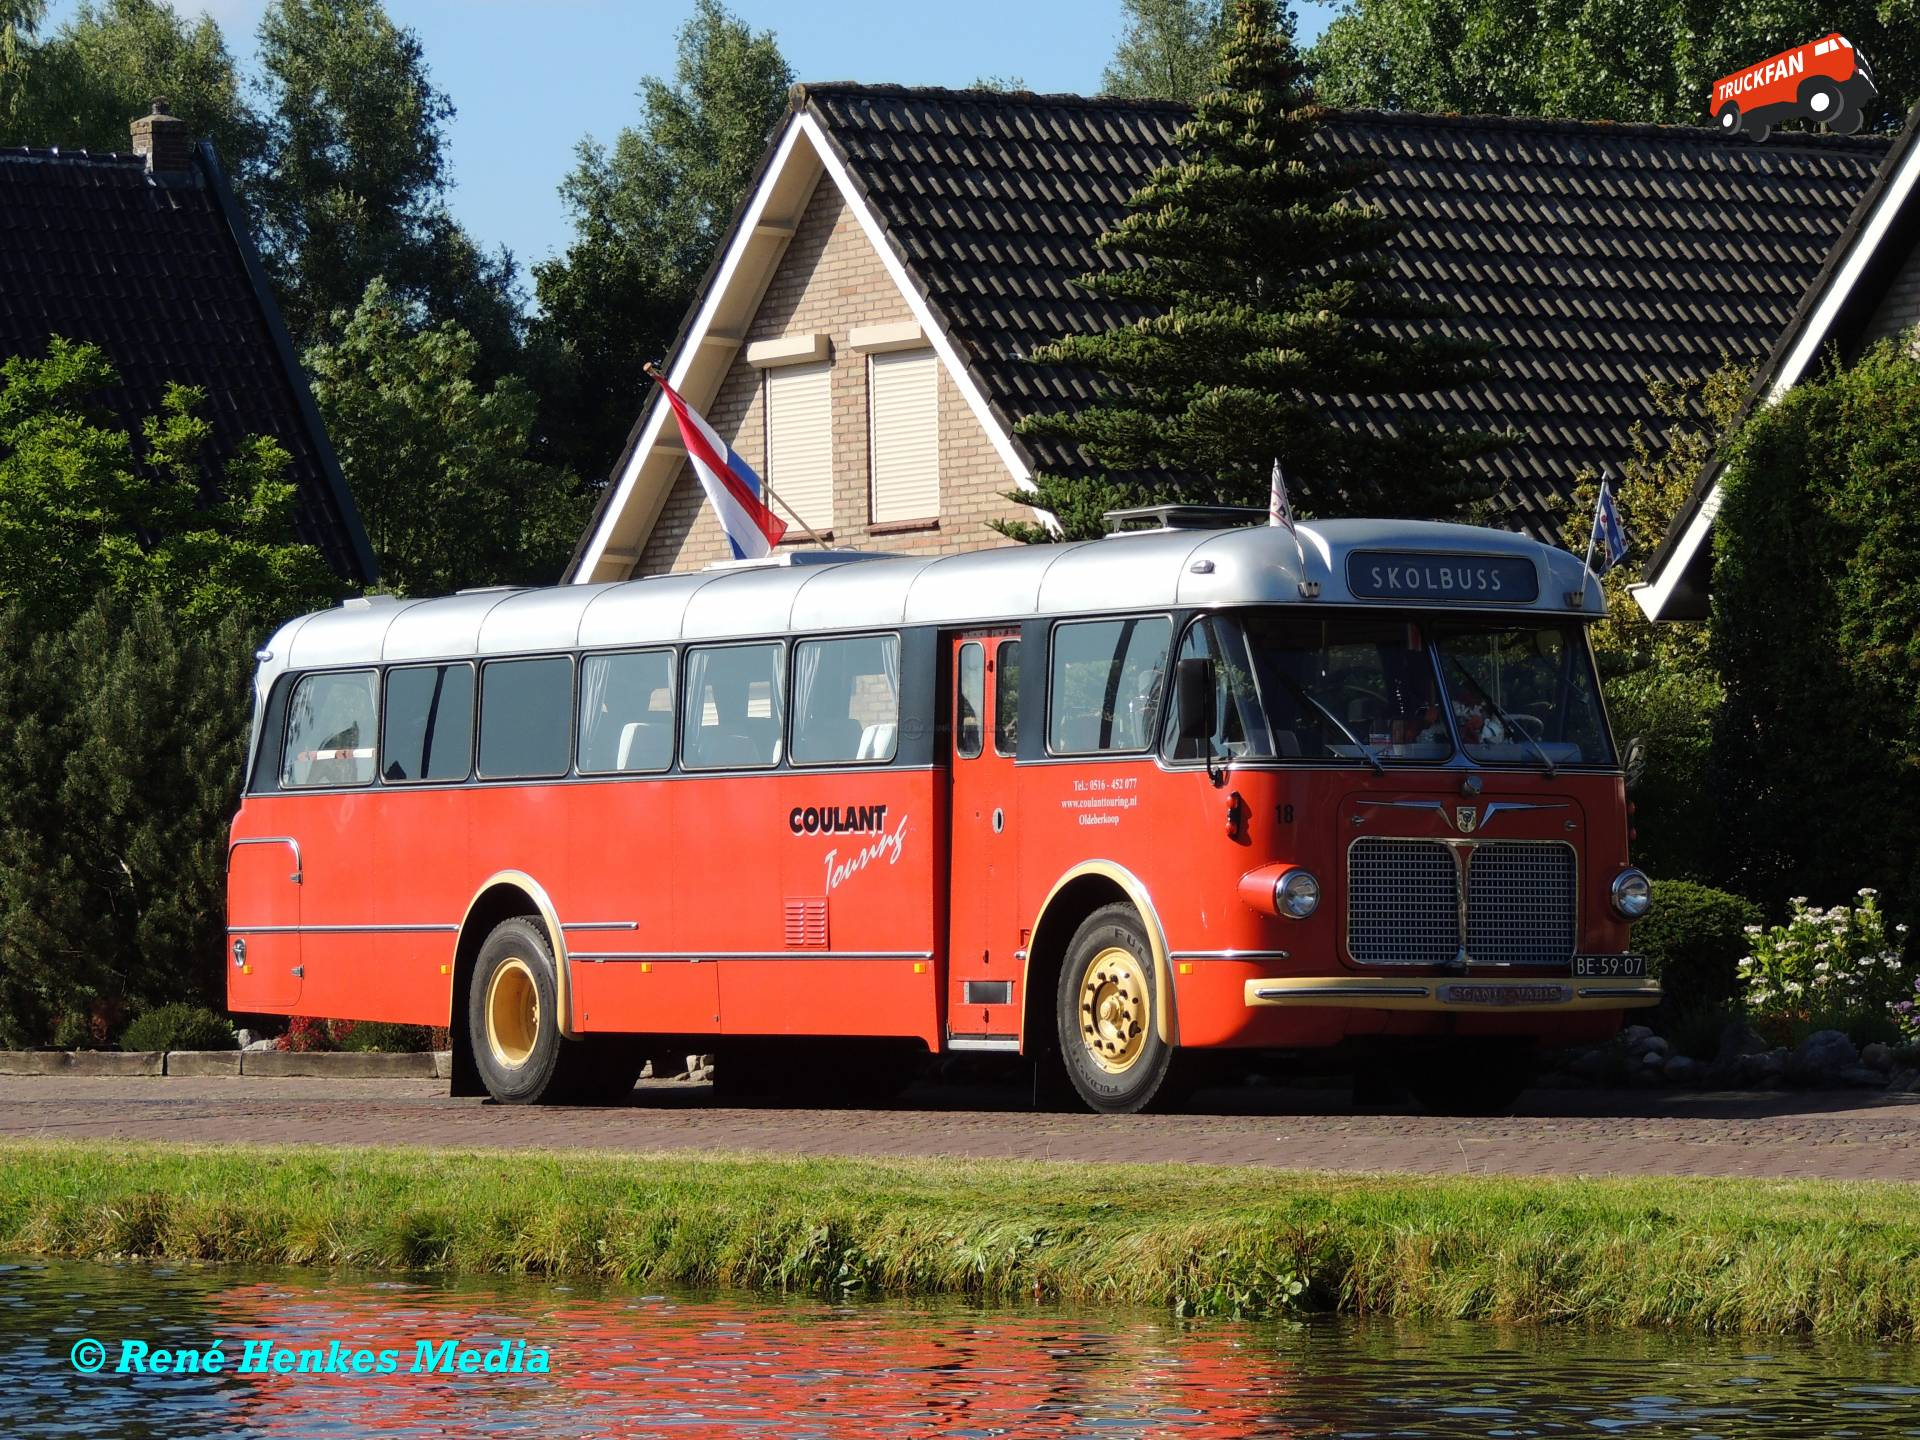 Scania-Vabis B56